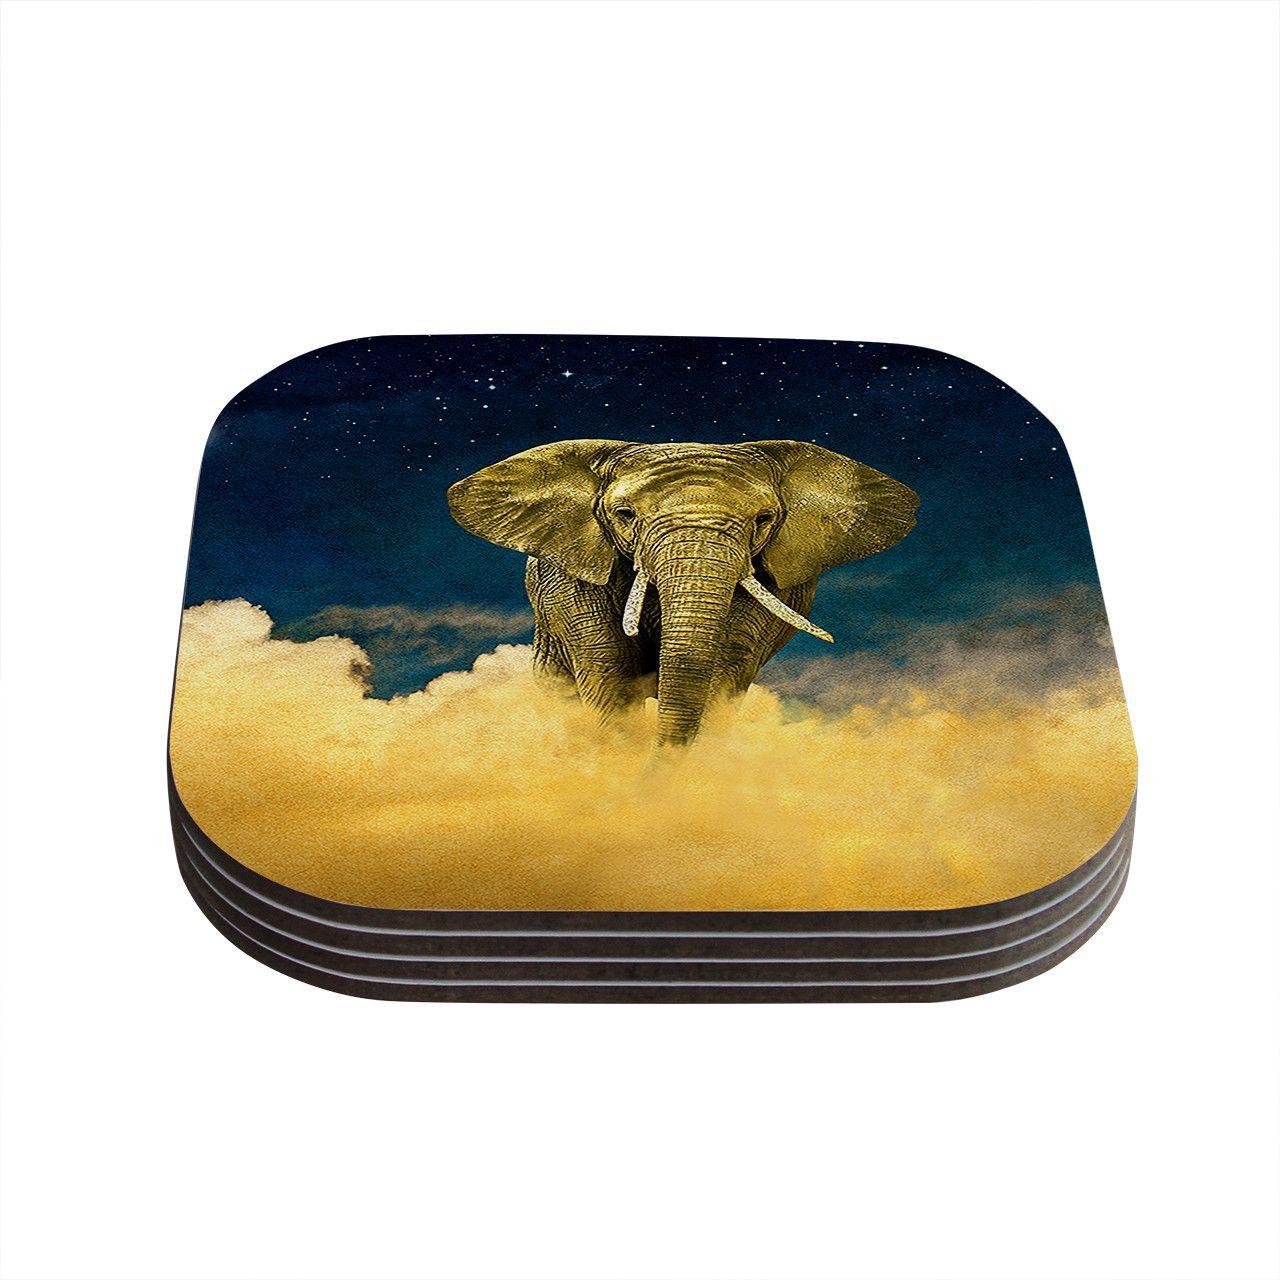 "Nick Atkinson ""Celestial Elephant"" Black Blue Coasters (Set of 4)"